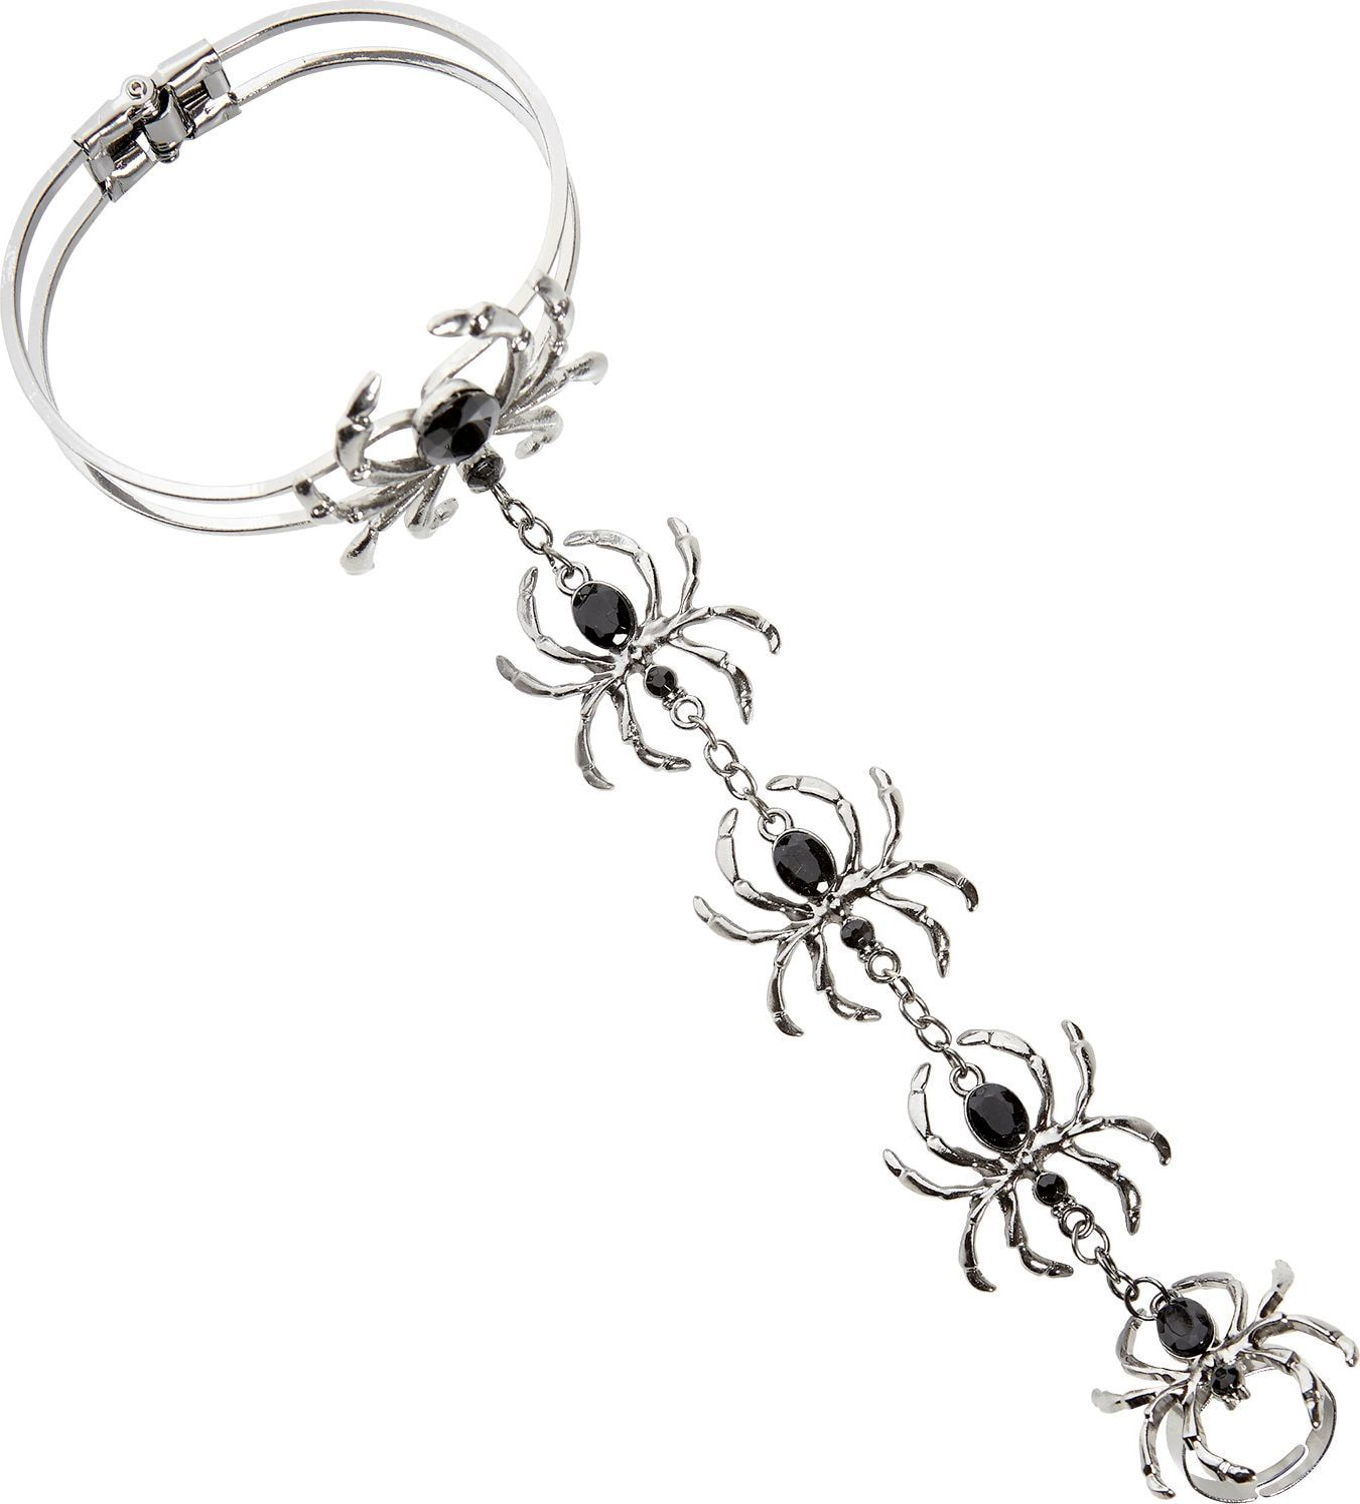 Spinnen armband met ring